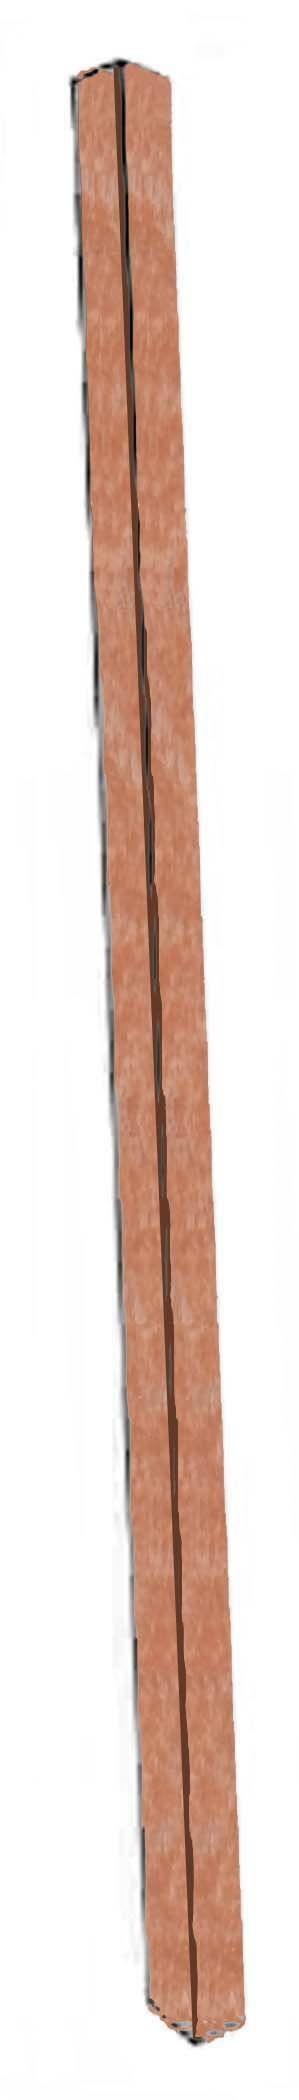 Aarco Products SPP-5 Cedar Plastic Lumber Single Post